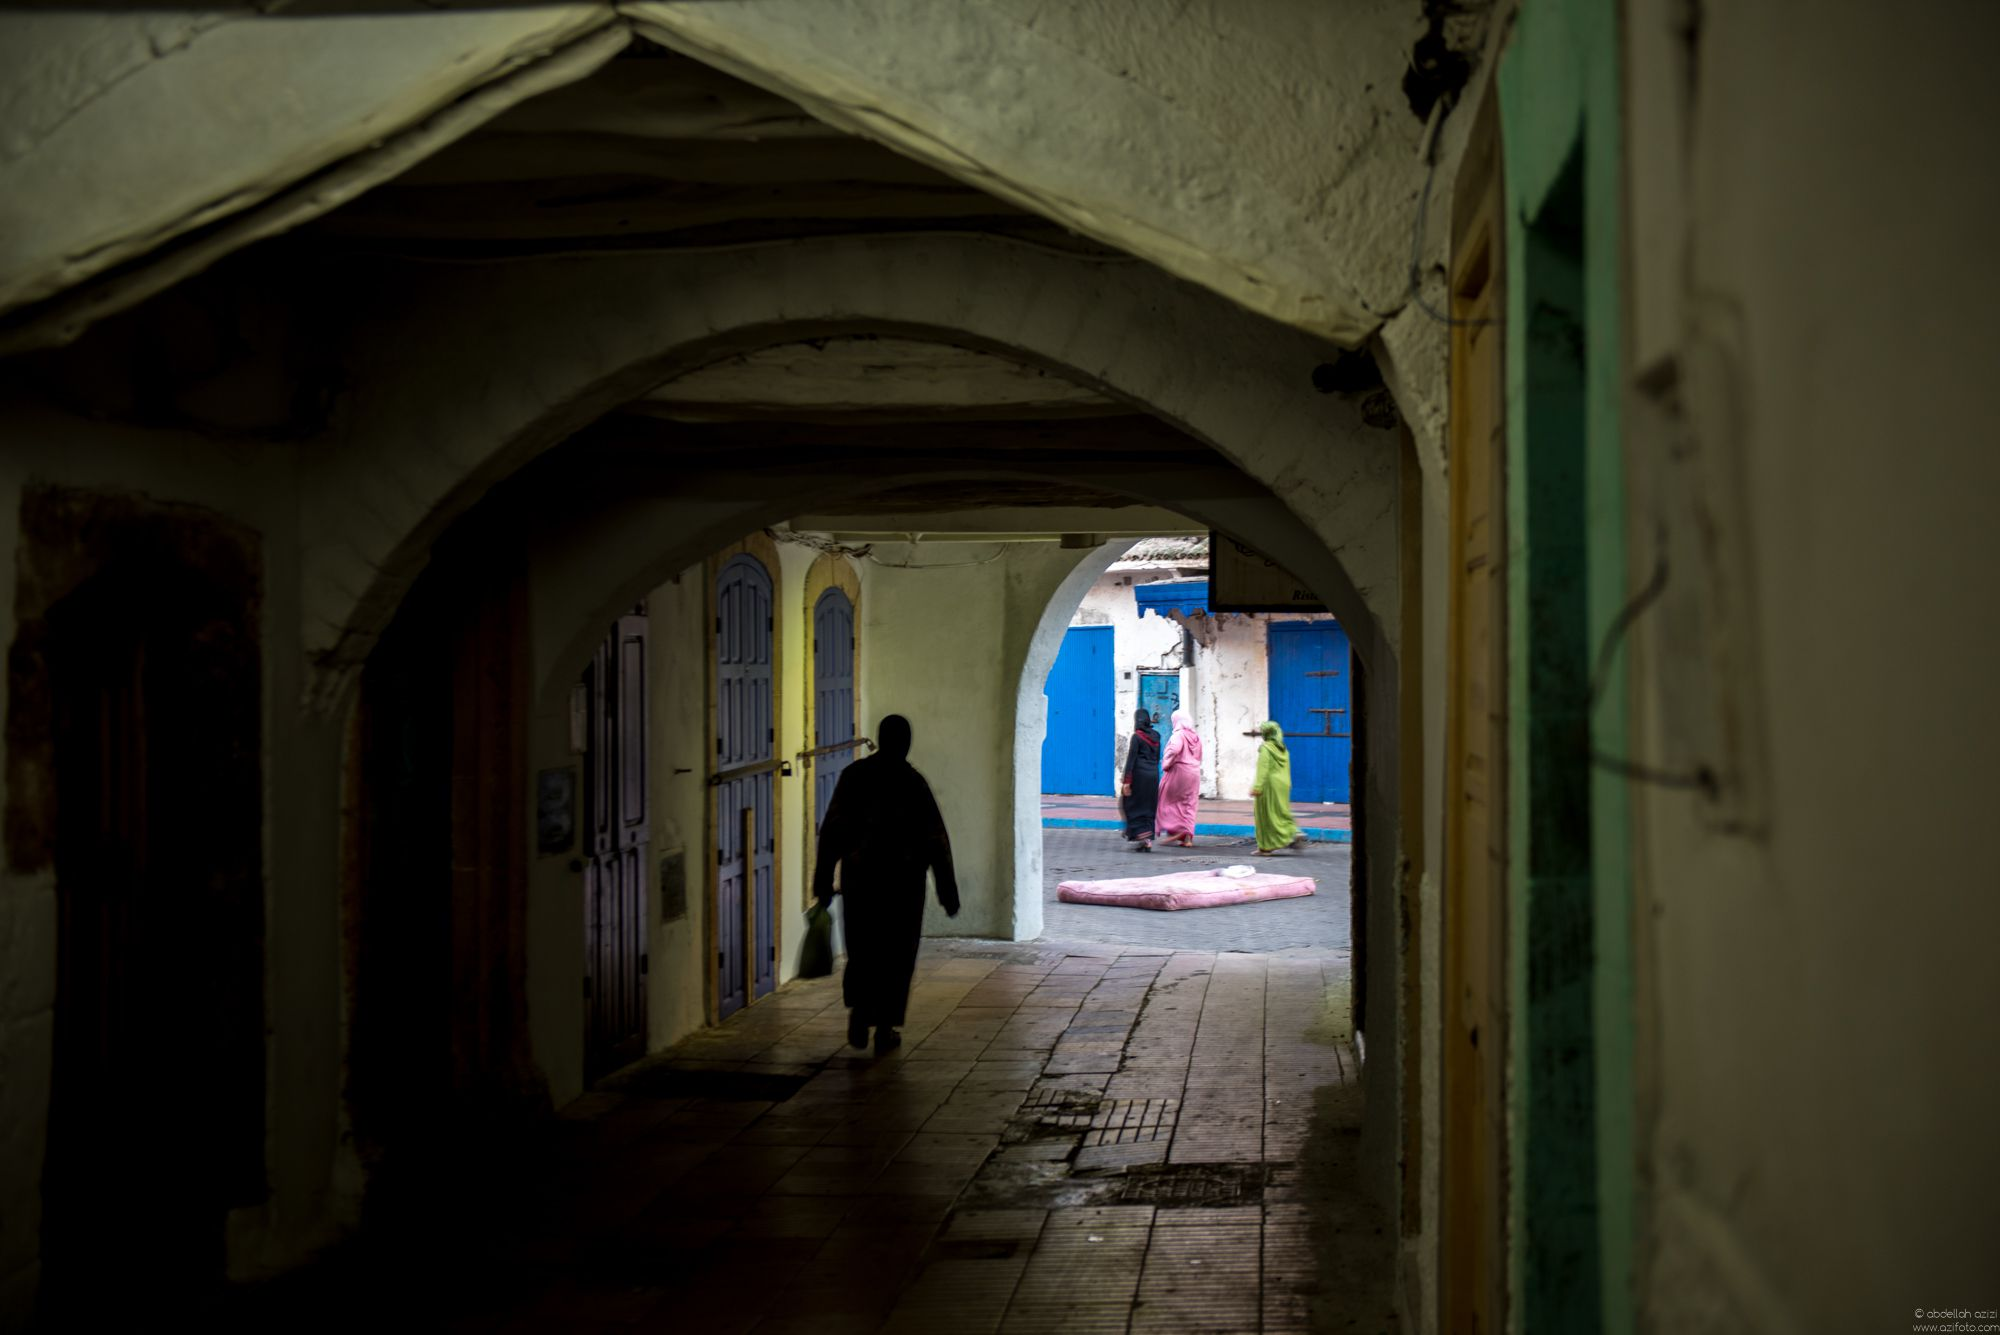 Essaouira, bed in the street